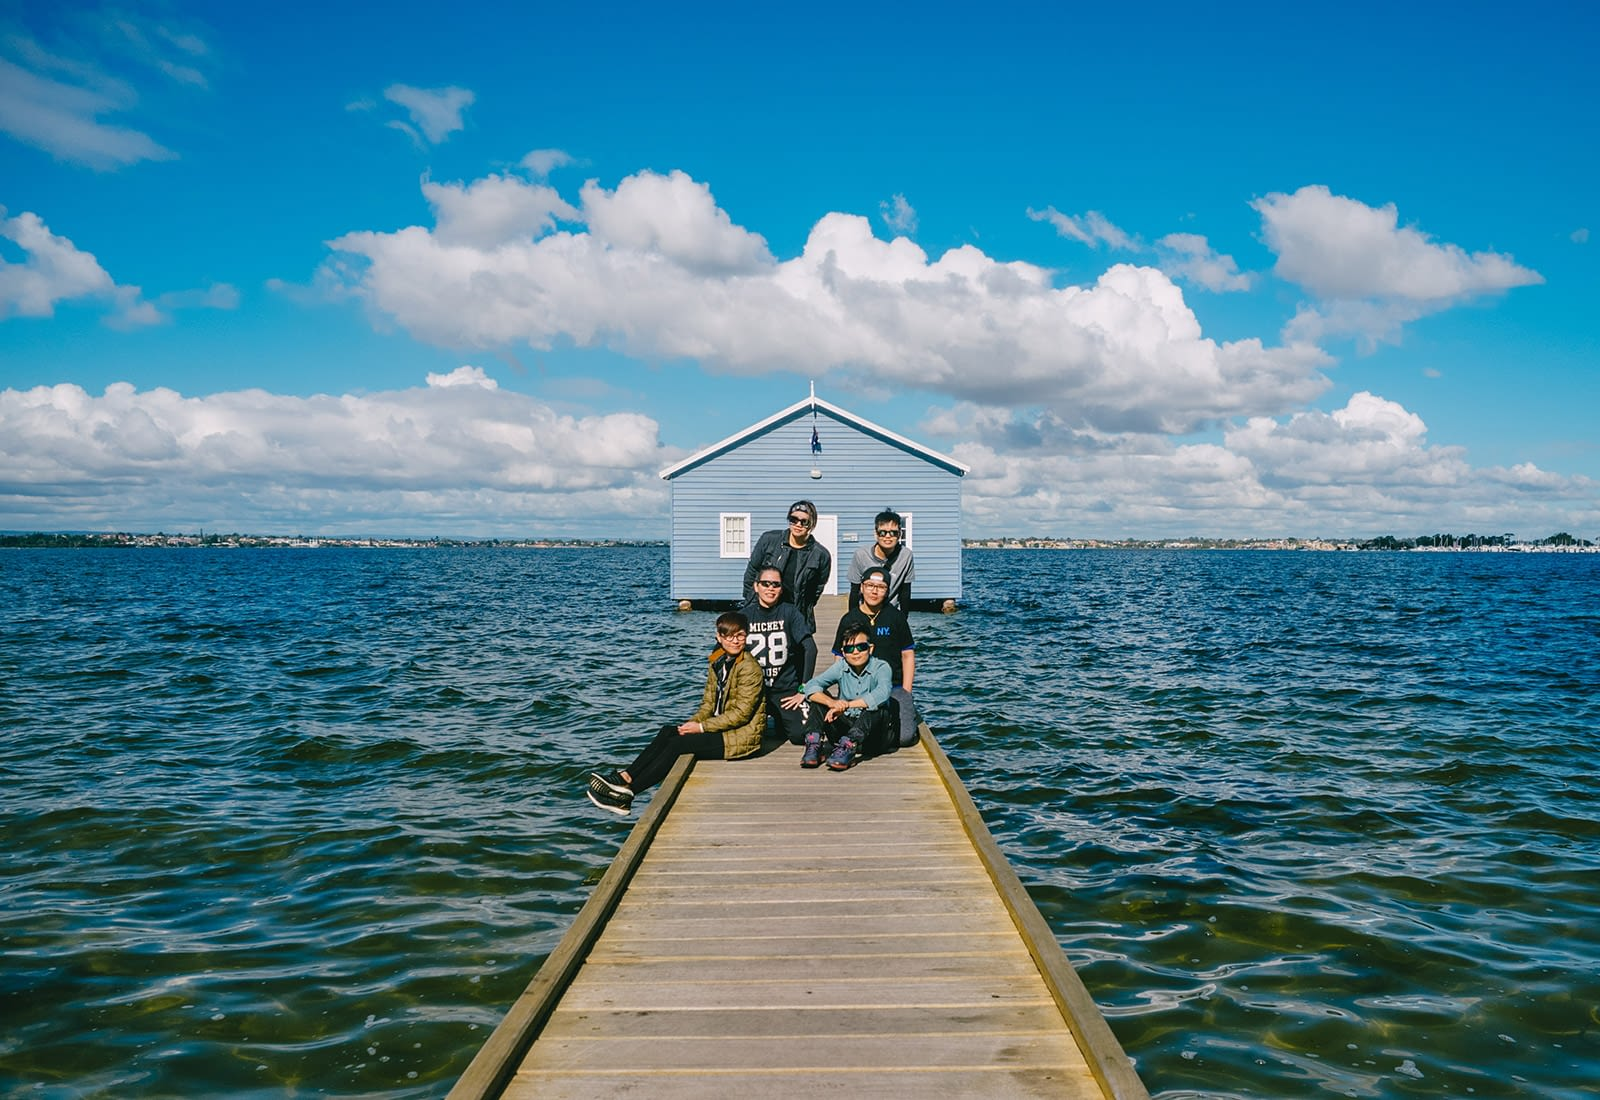 Perth, Australia - Blue Boat House - Groupshot